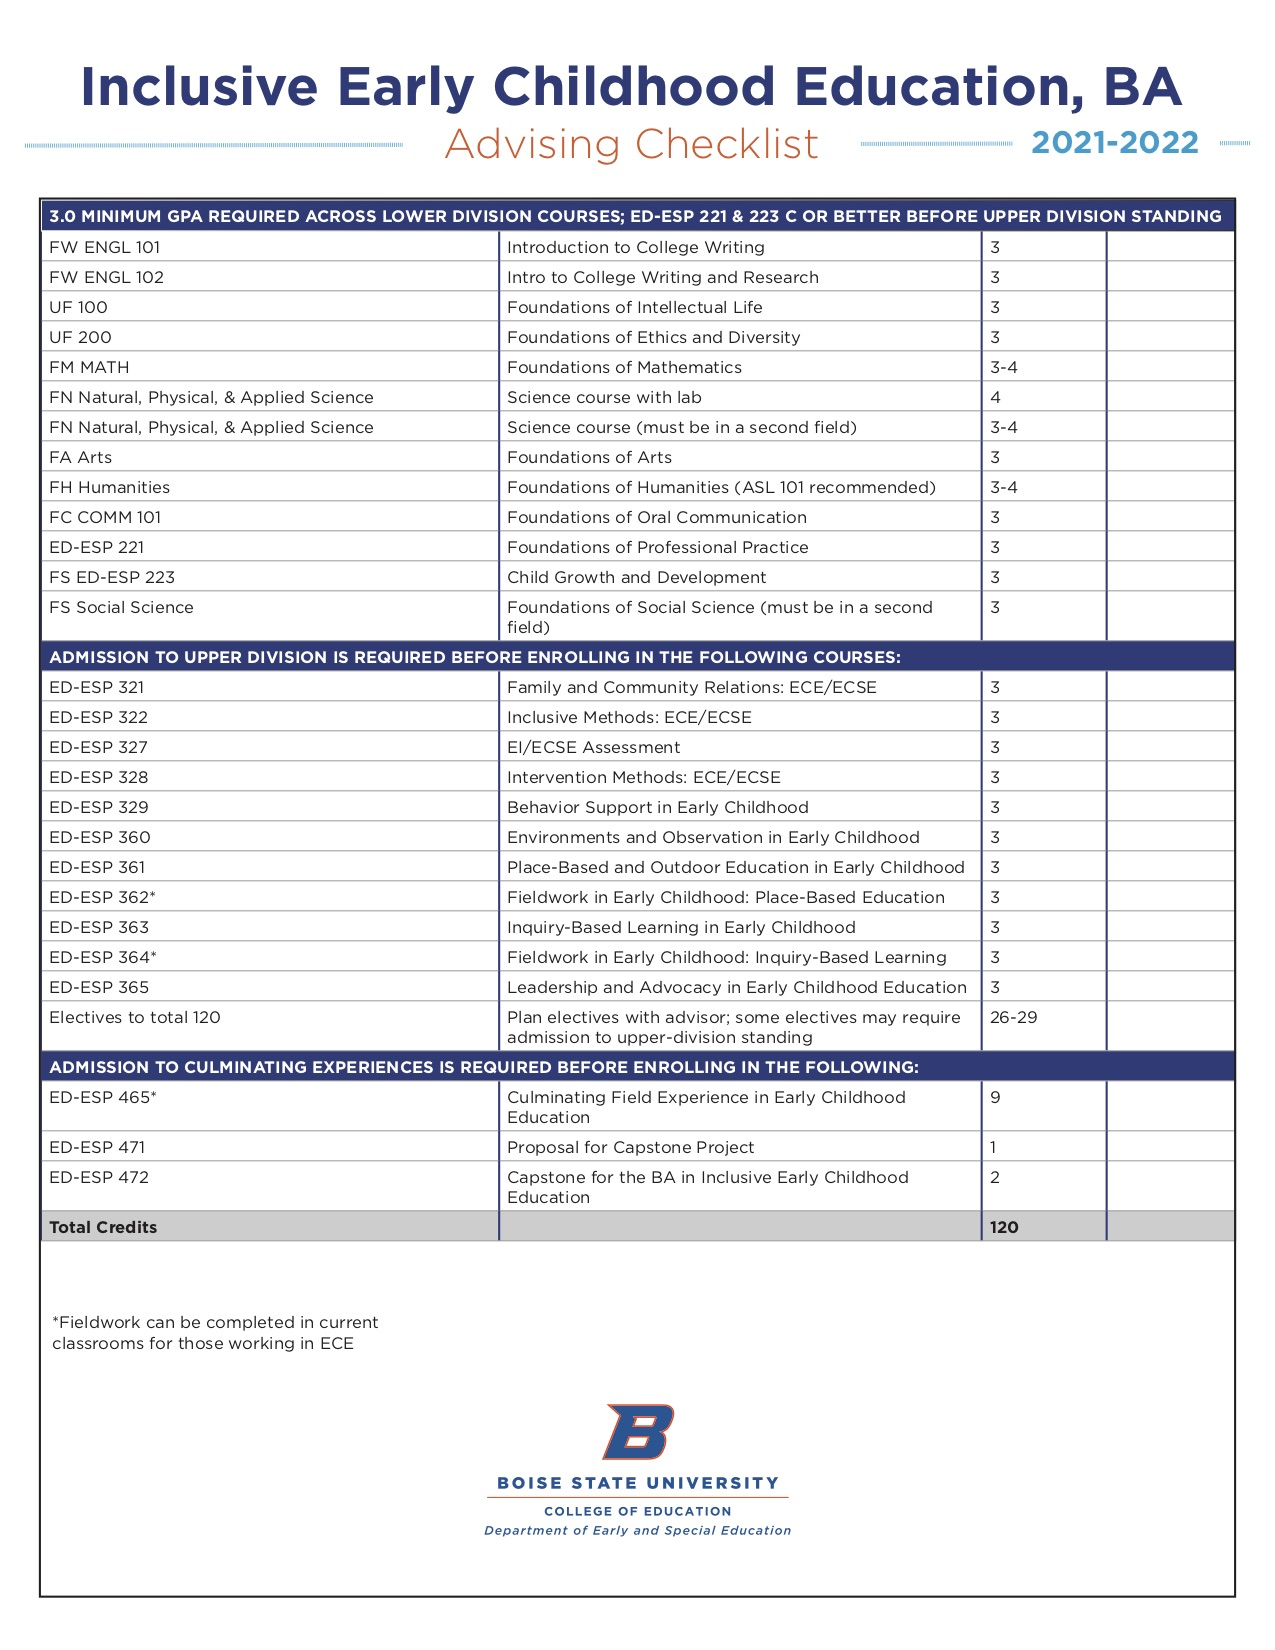 Visual Advising Checklist